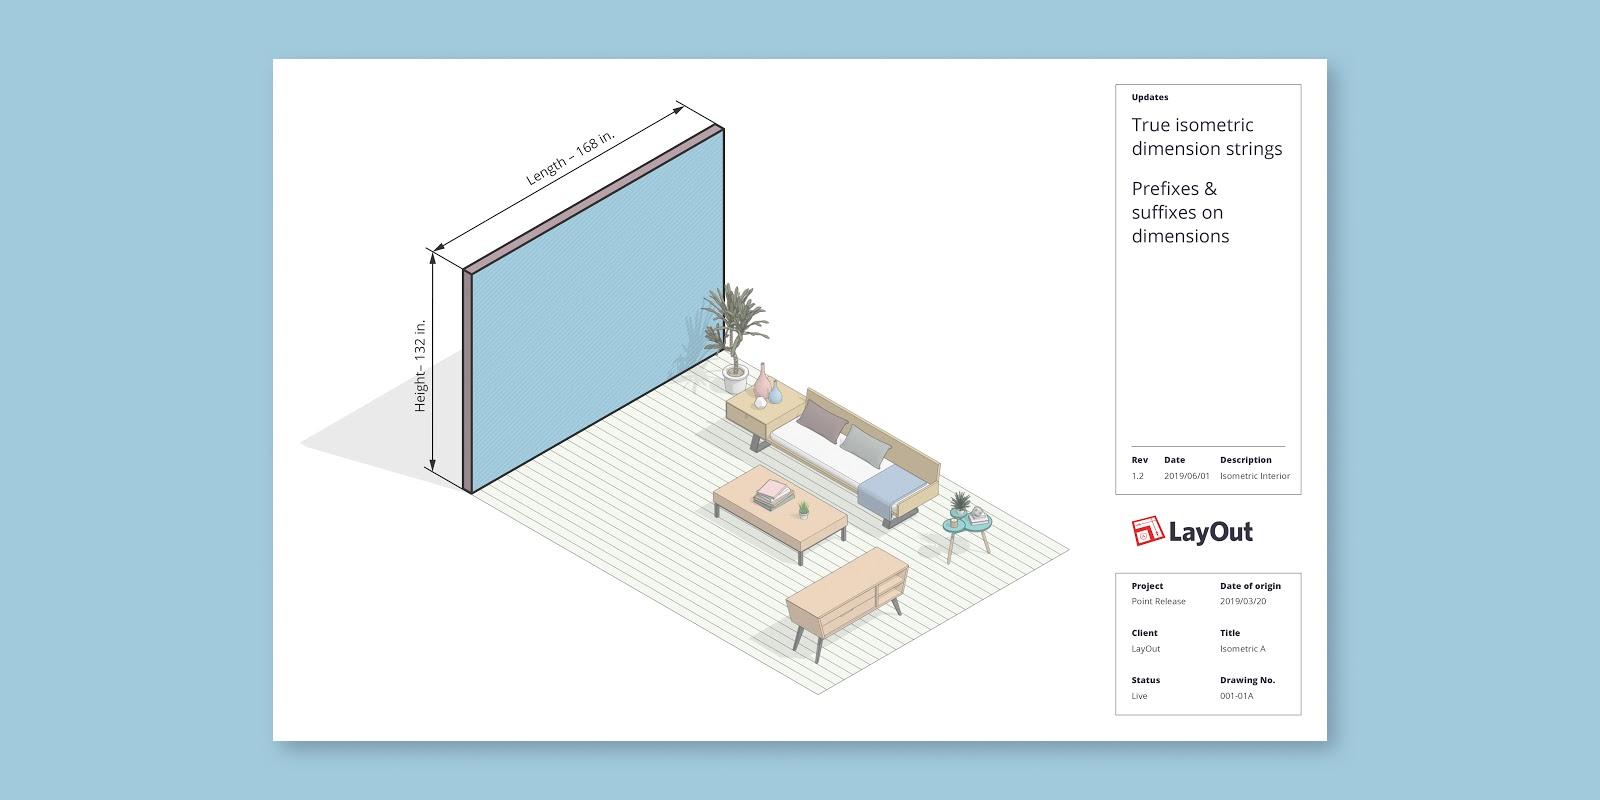 Releases & Upgrades | 3D Design News, Software Releases & More - CAD